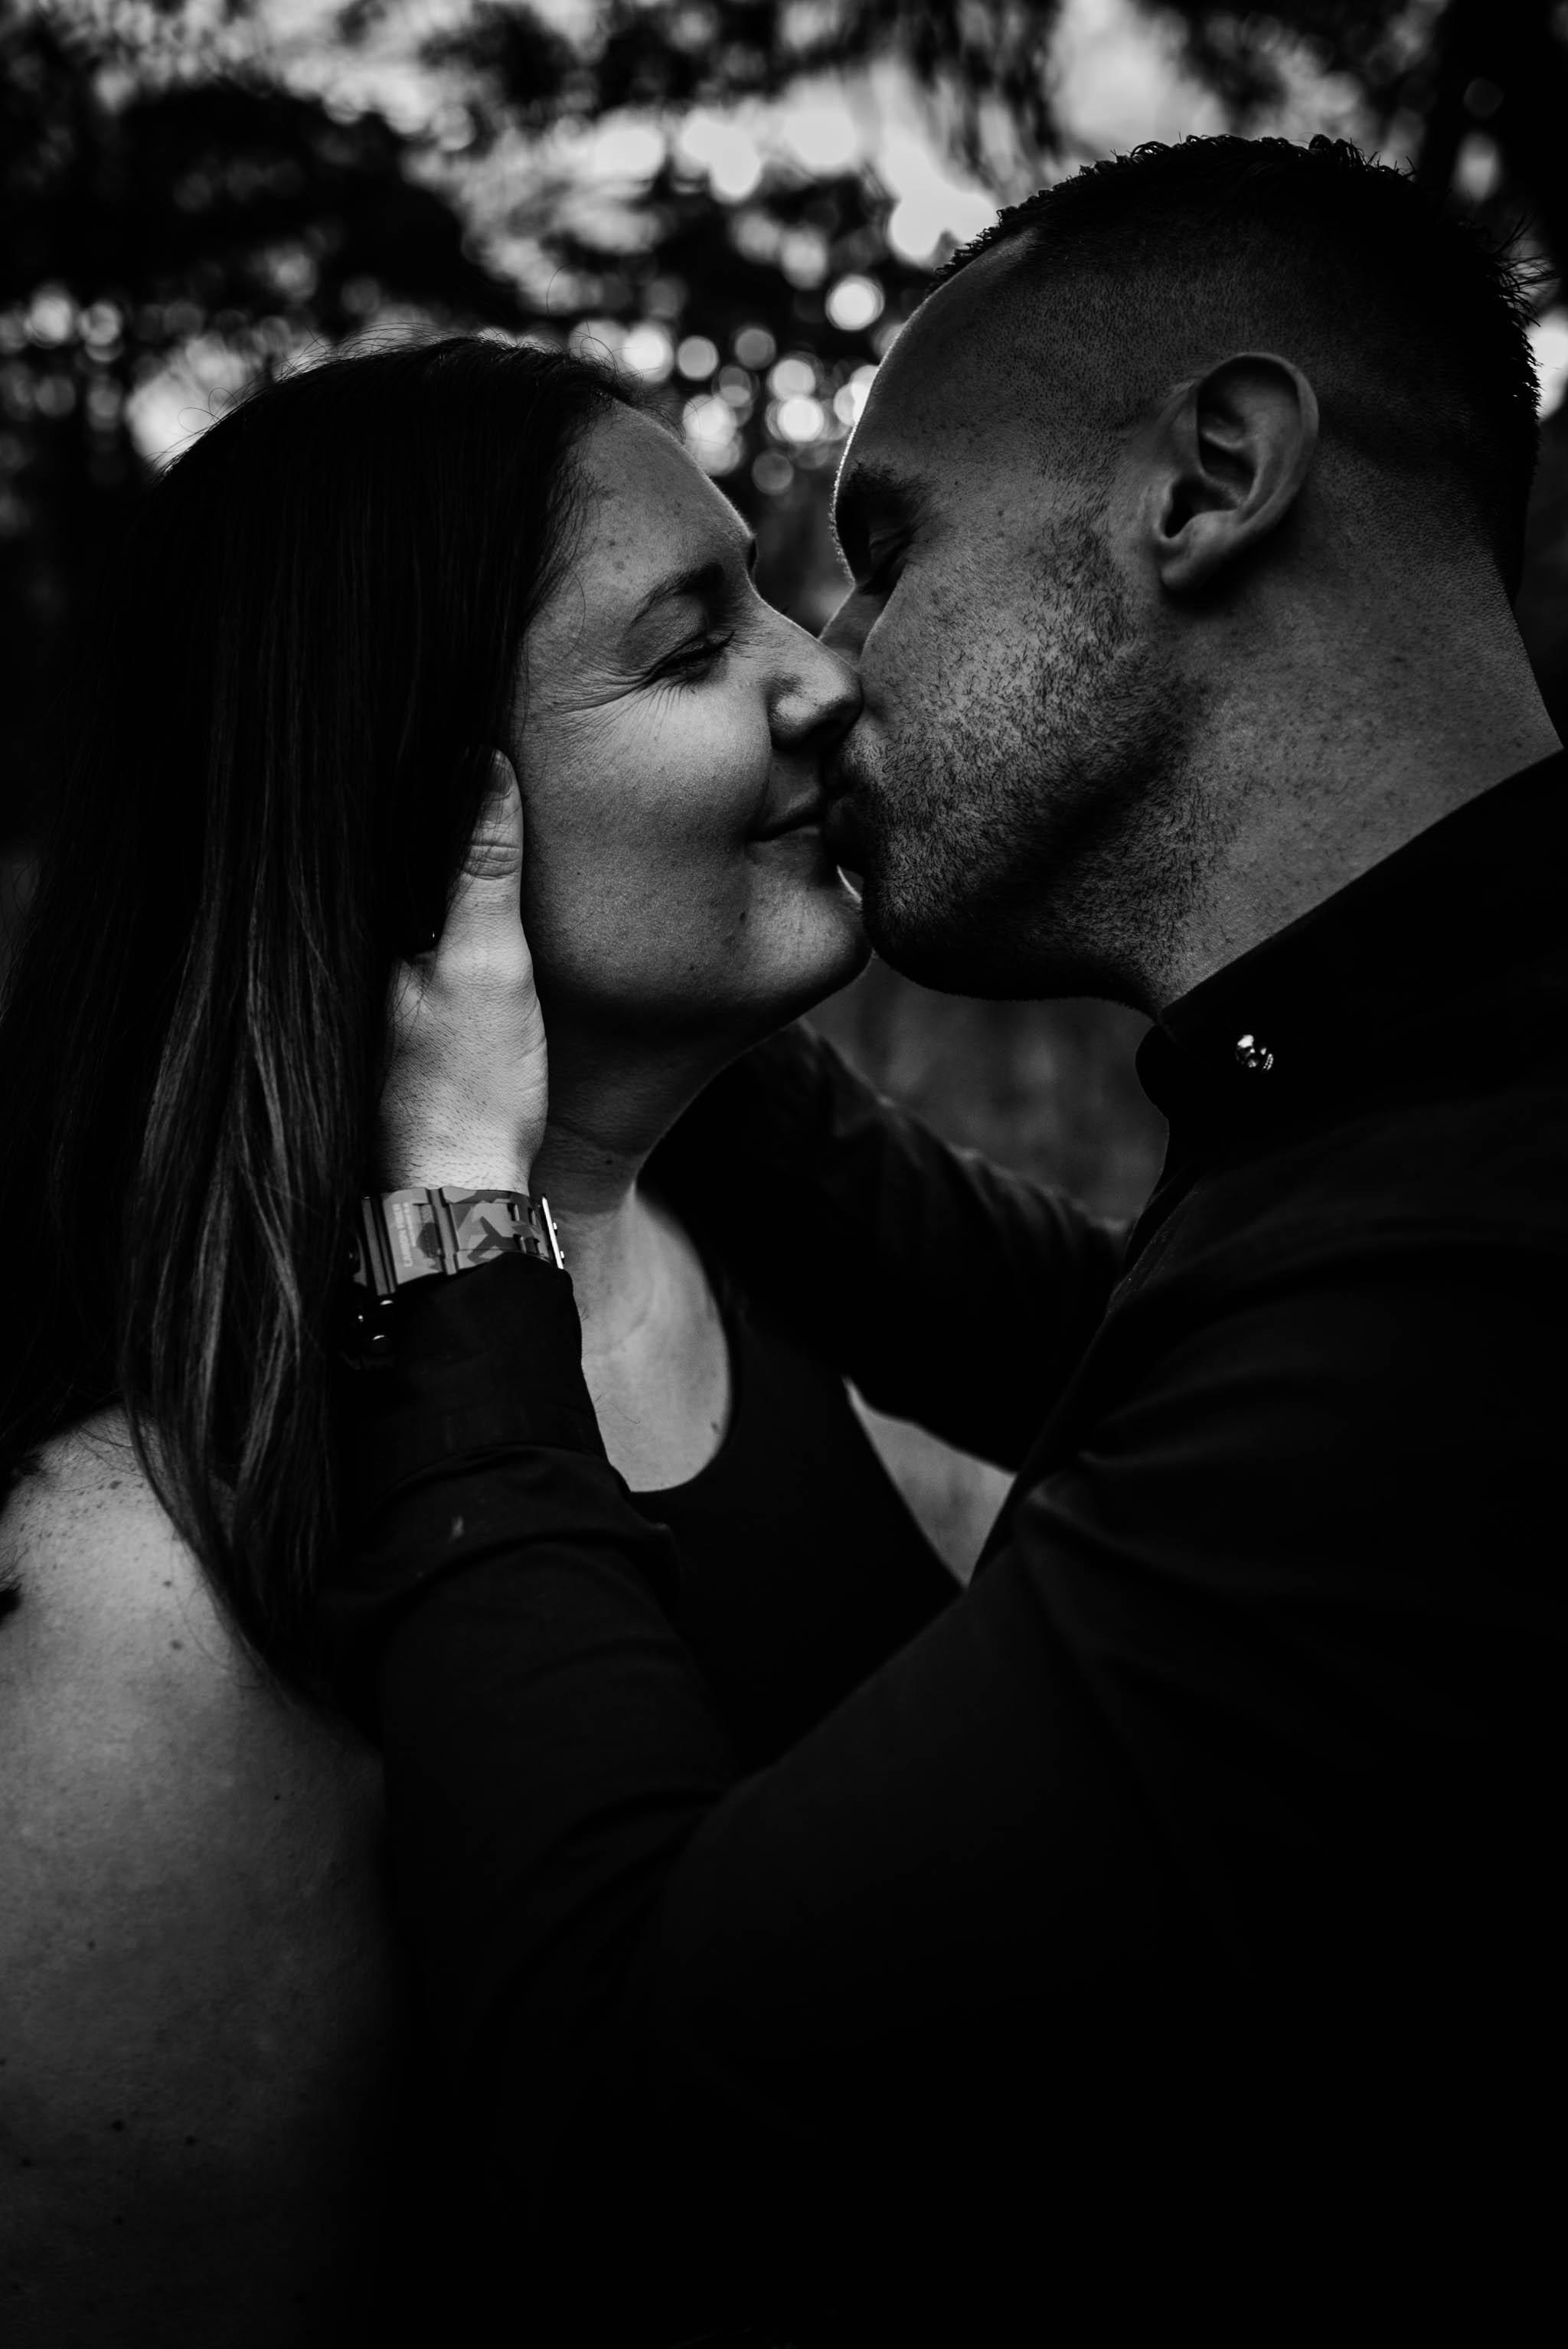 launceston couples photographer-8.jpg